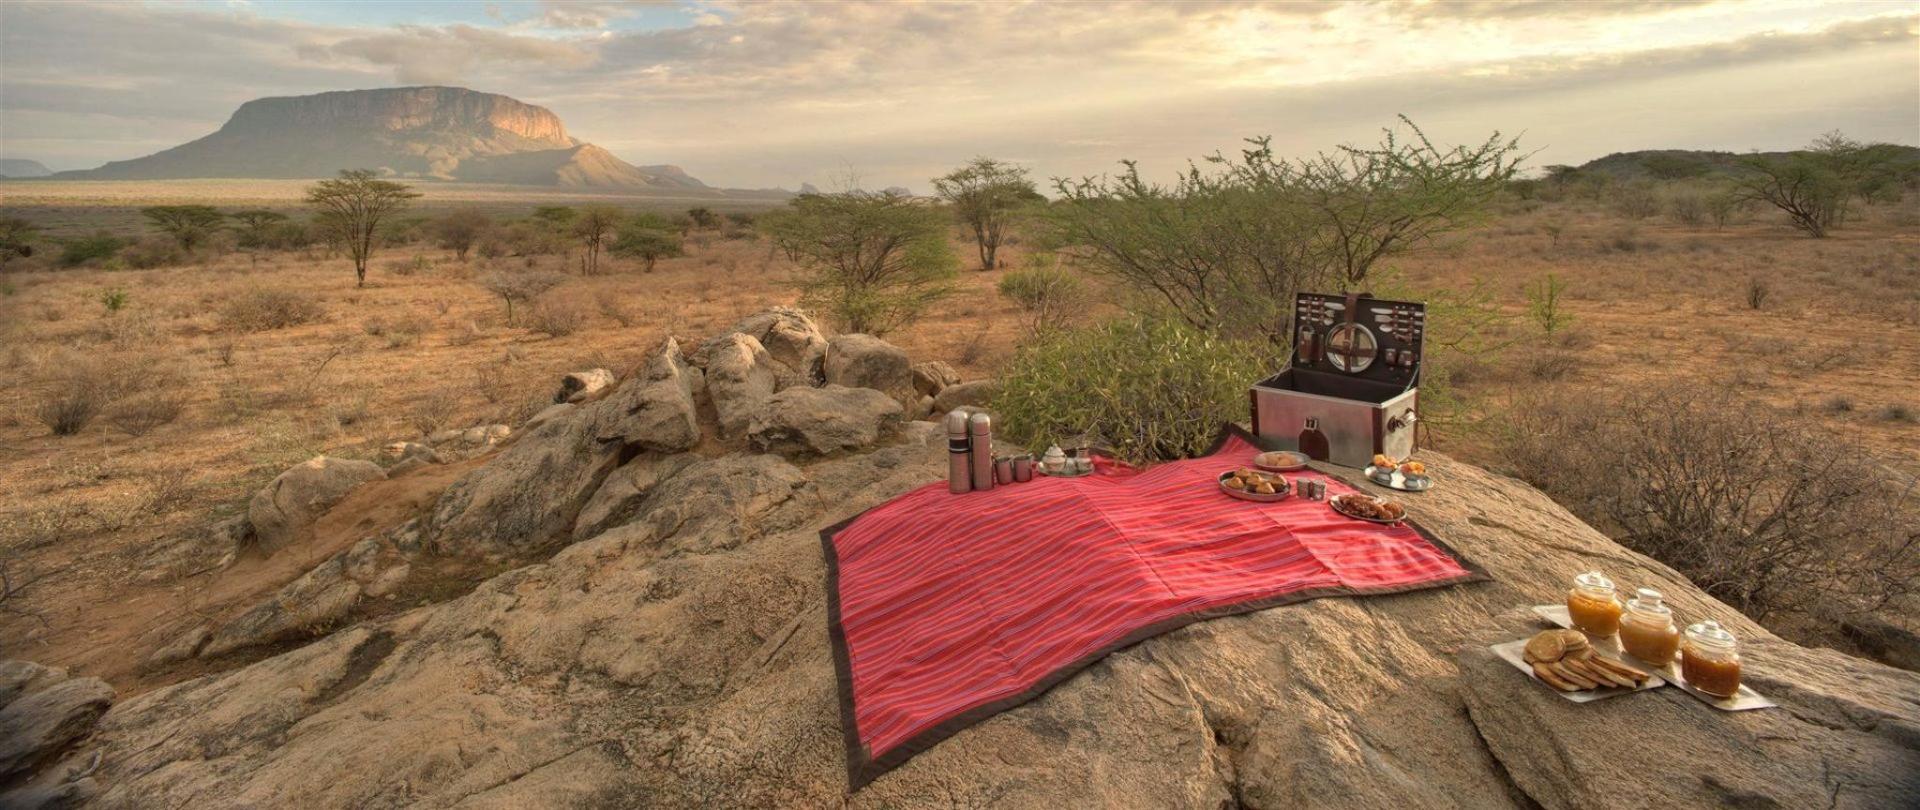 picnics-in-the-wilderness.jpg